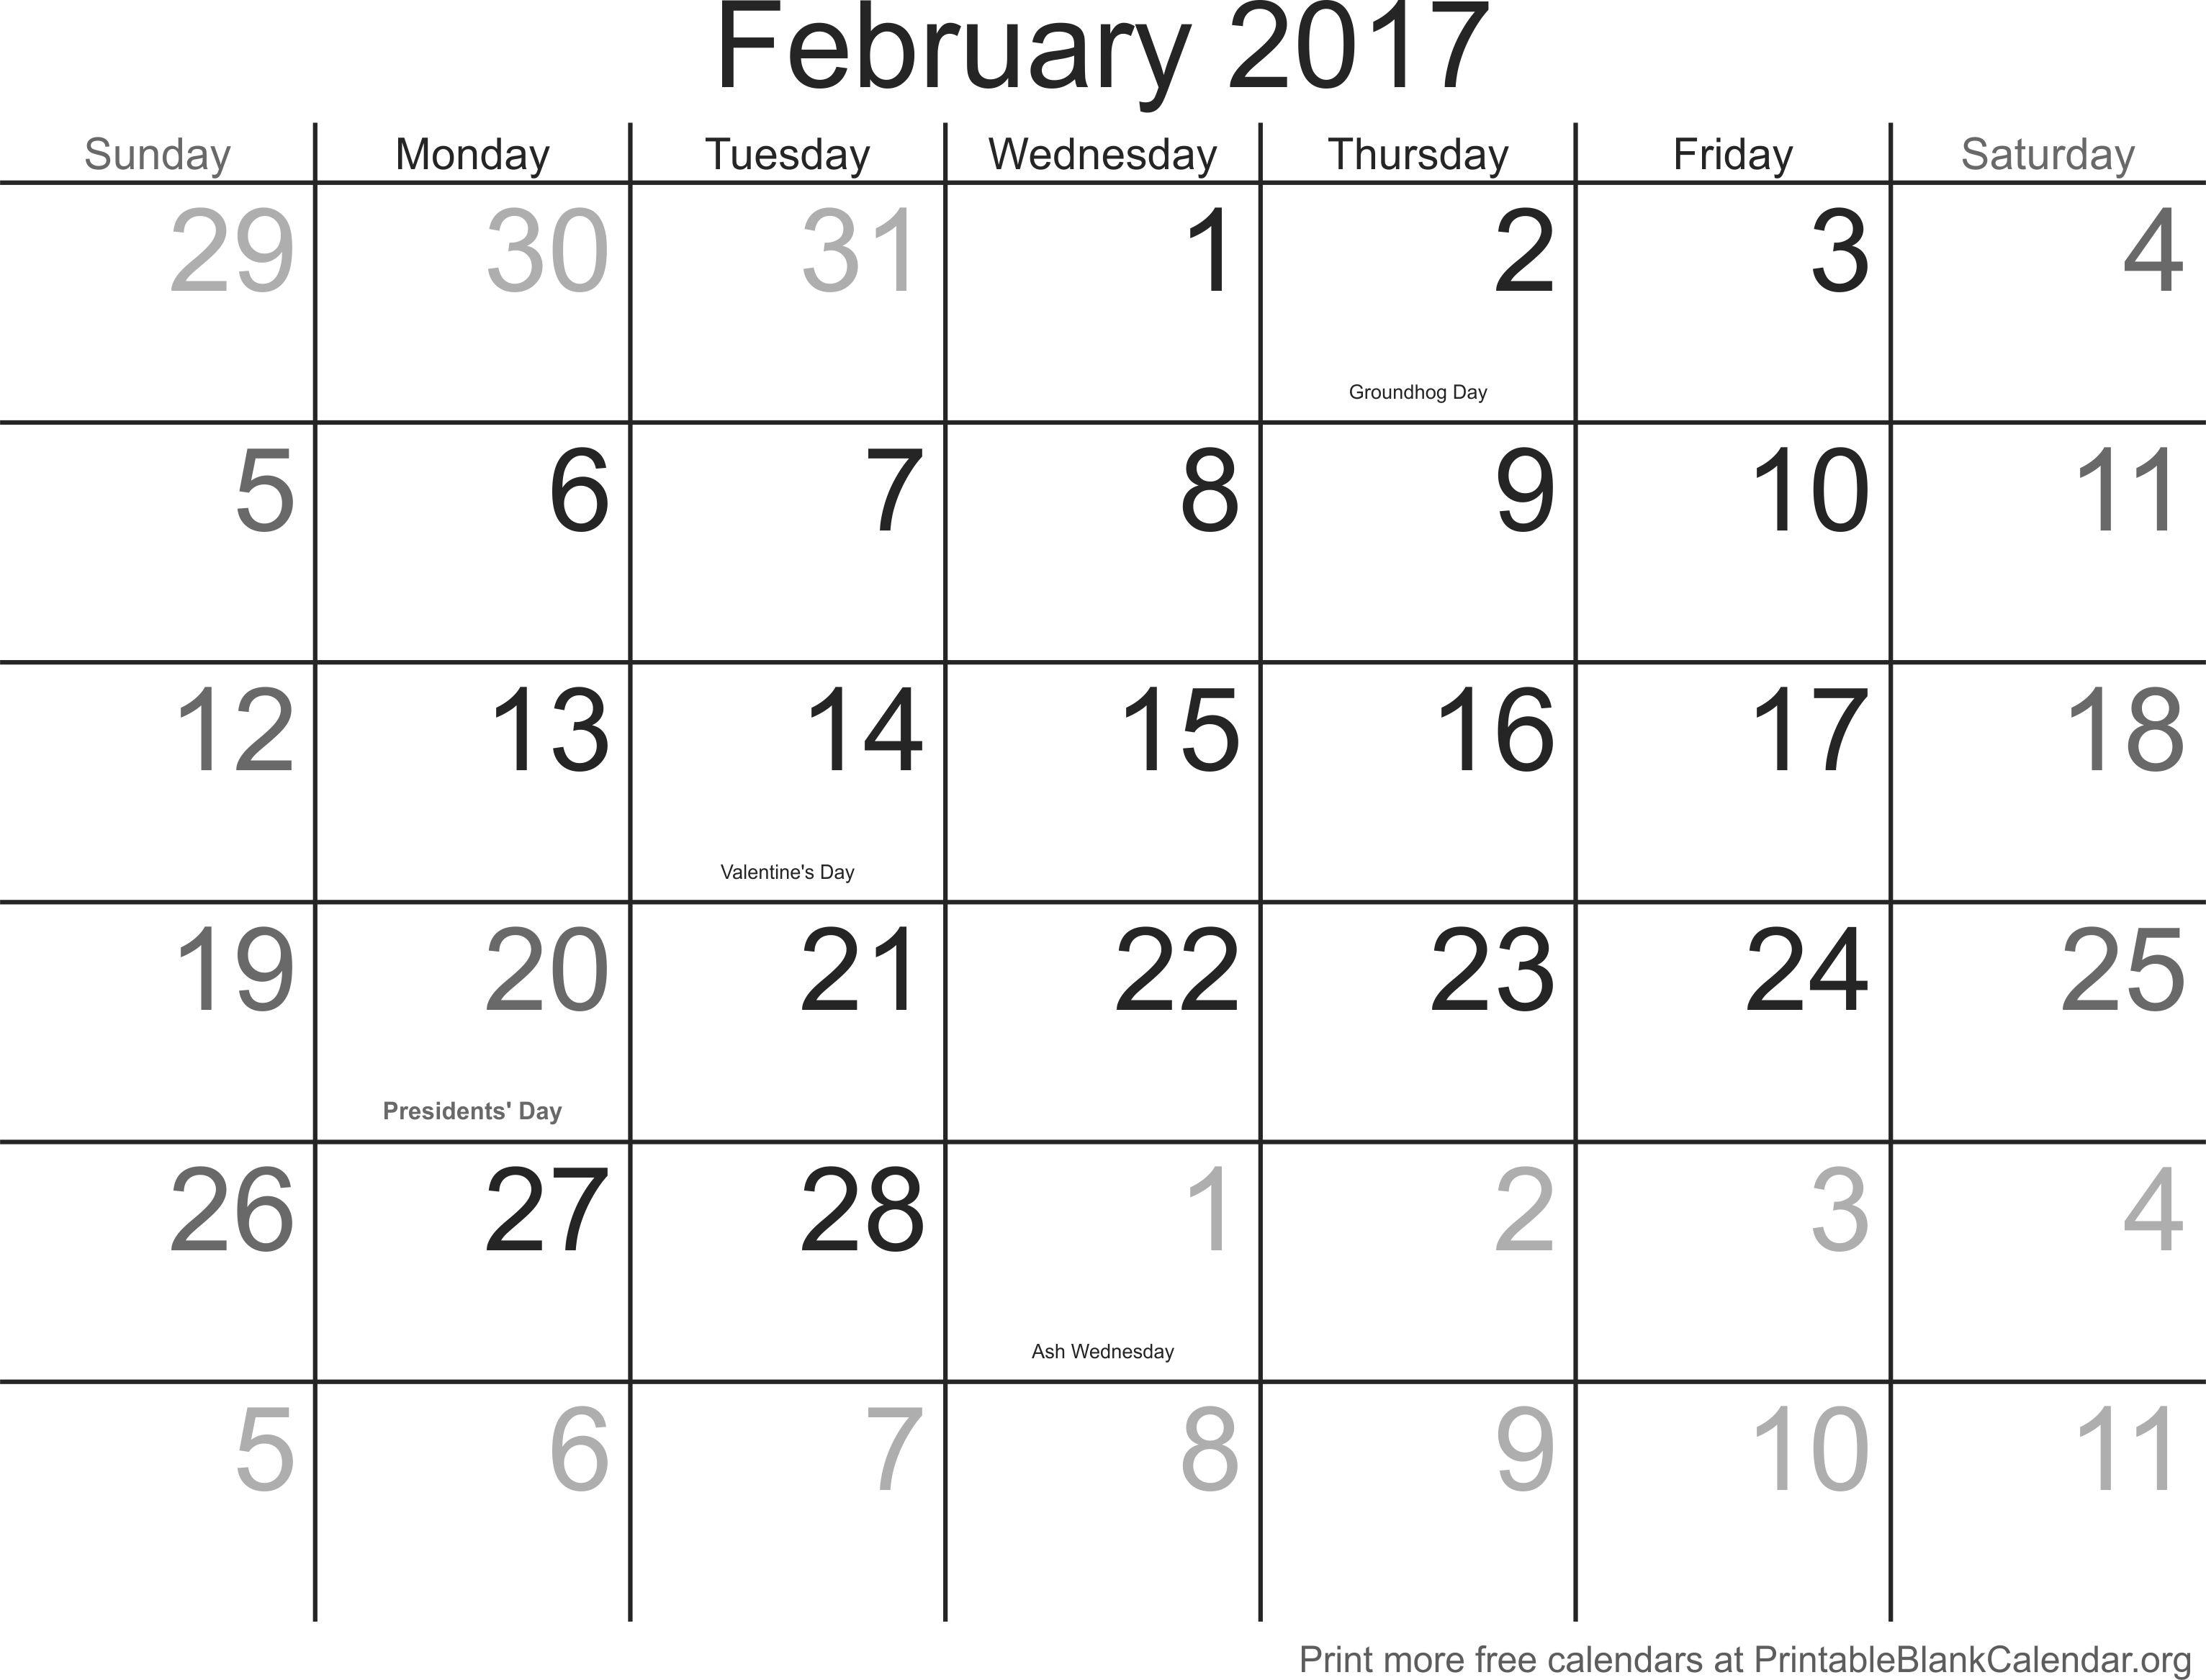 February 2017 Printable Calendar